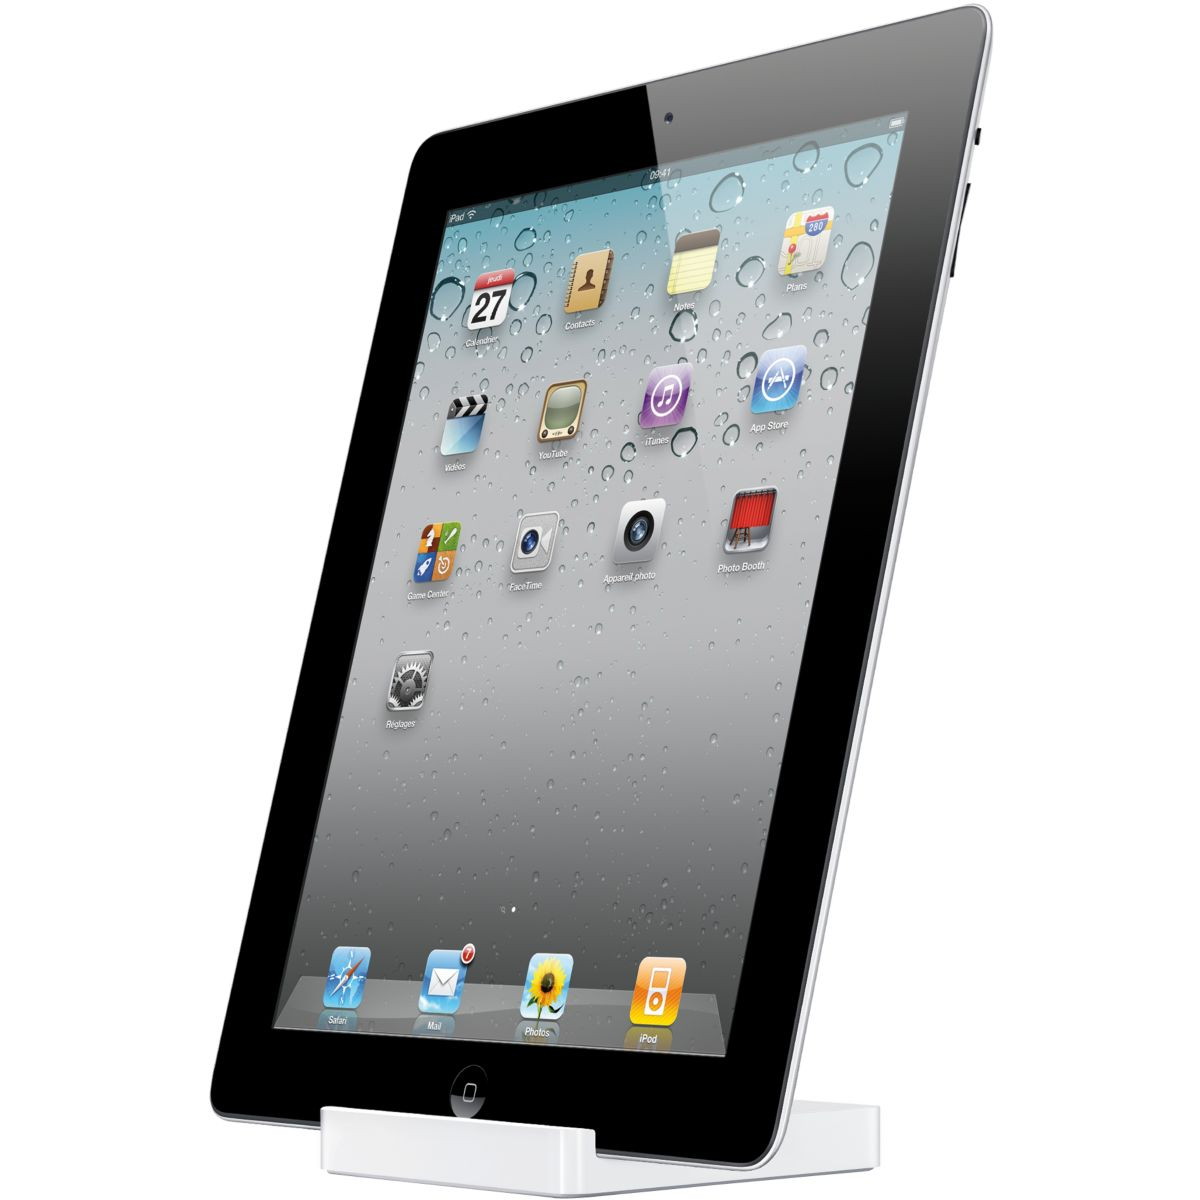 apple ipad 2 16 go comparer avec. Black Bedroom Furniture Sets. Home Design Ideas